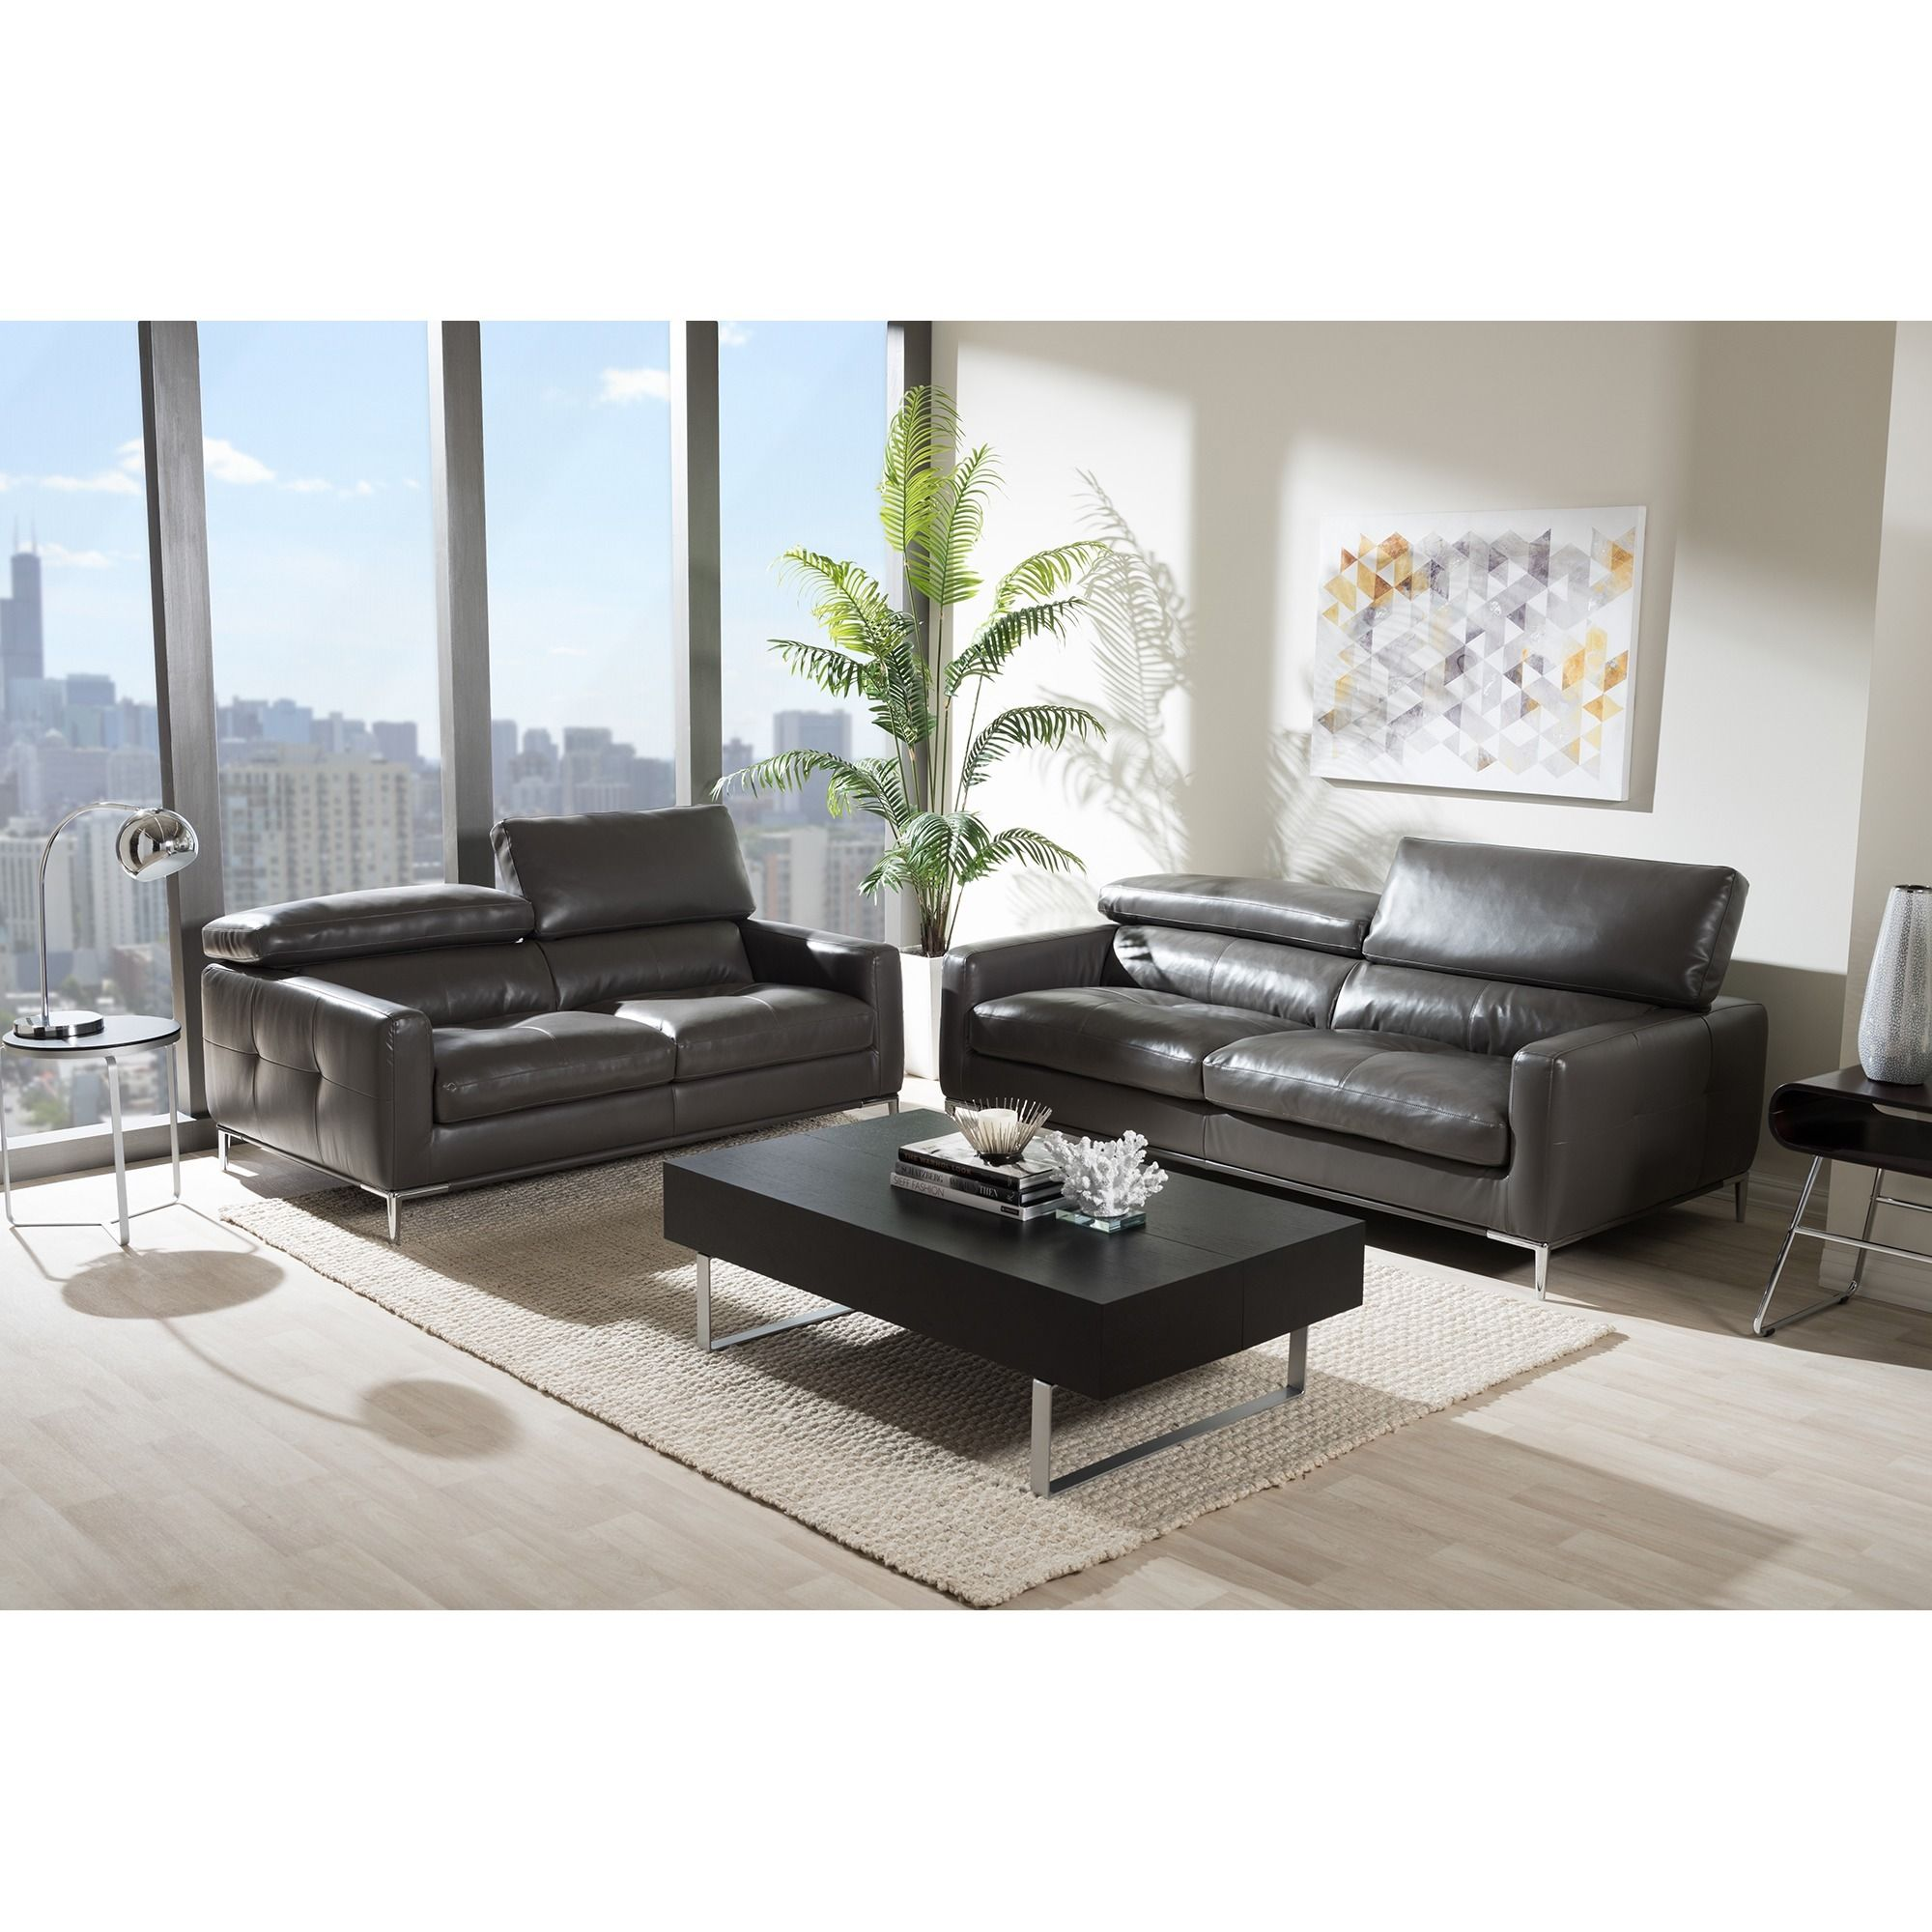 Poundex Bobkona Ellis Bonded Leather Sofa and Loveseat & Reviews